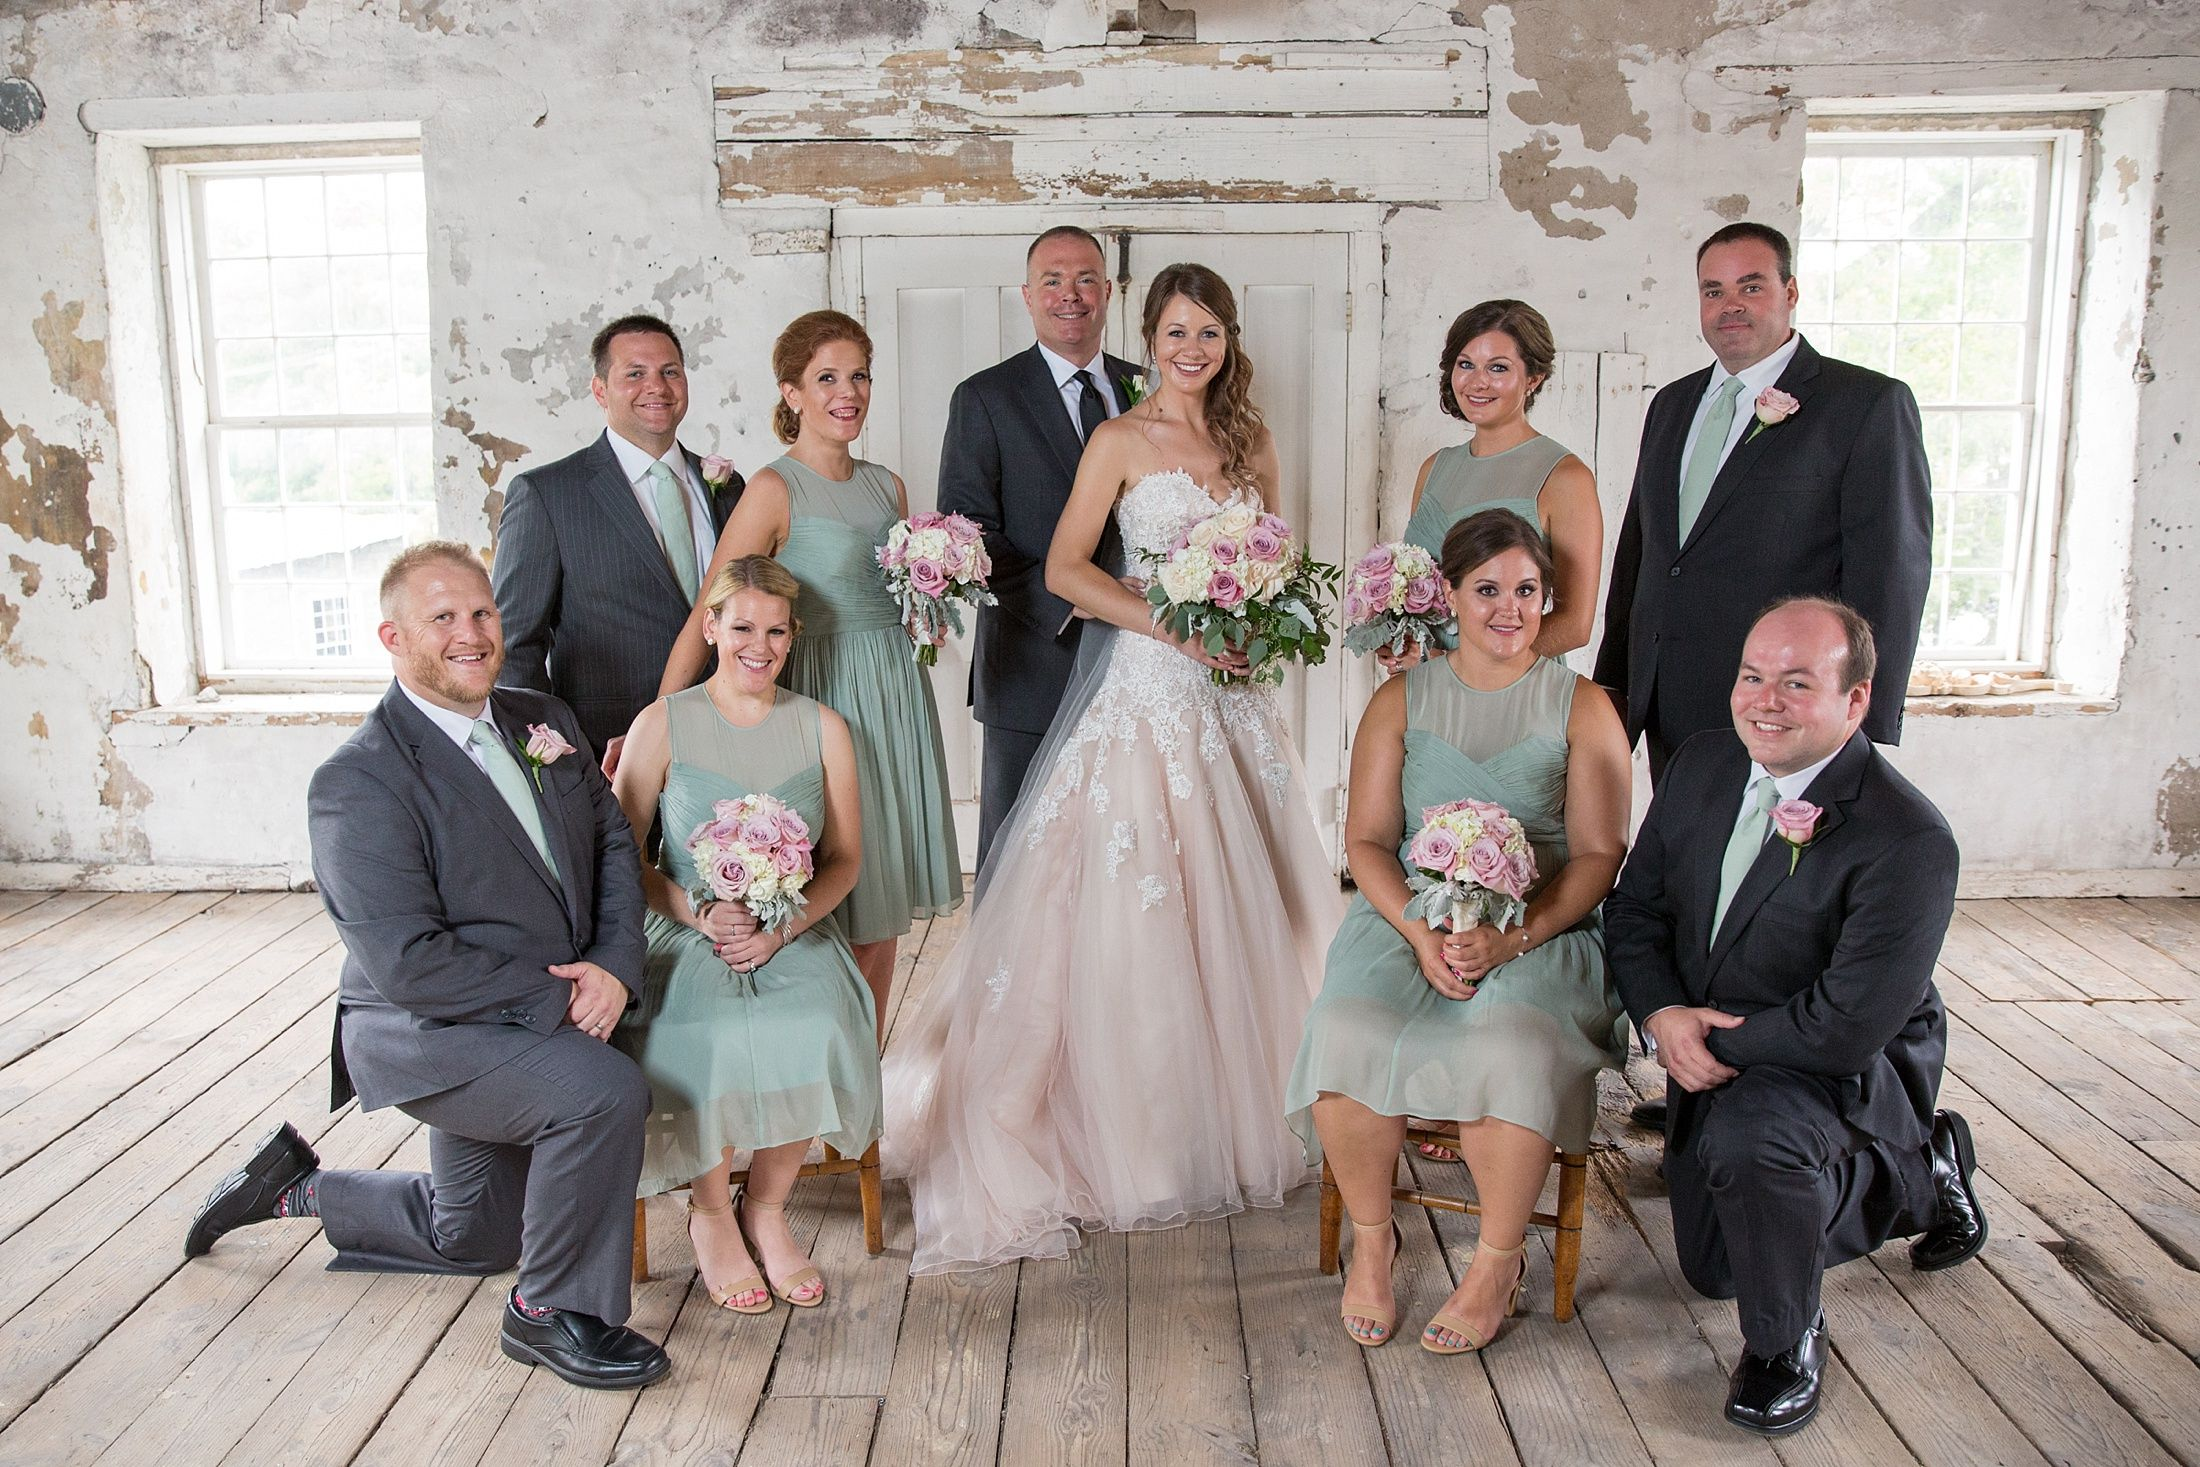 Syracuse Ny Sarah Heppell Photography Syracuse Wedding Photographers Sy Syracuse Wedding Photographer Industrial Chic Wedding Venue Wedding Party Photos